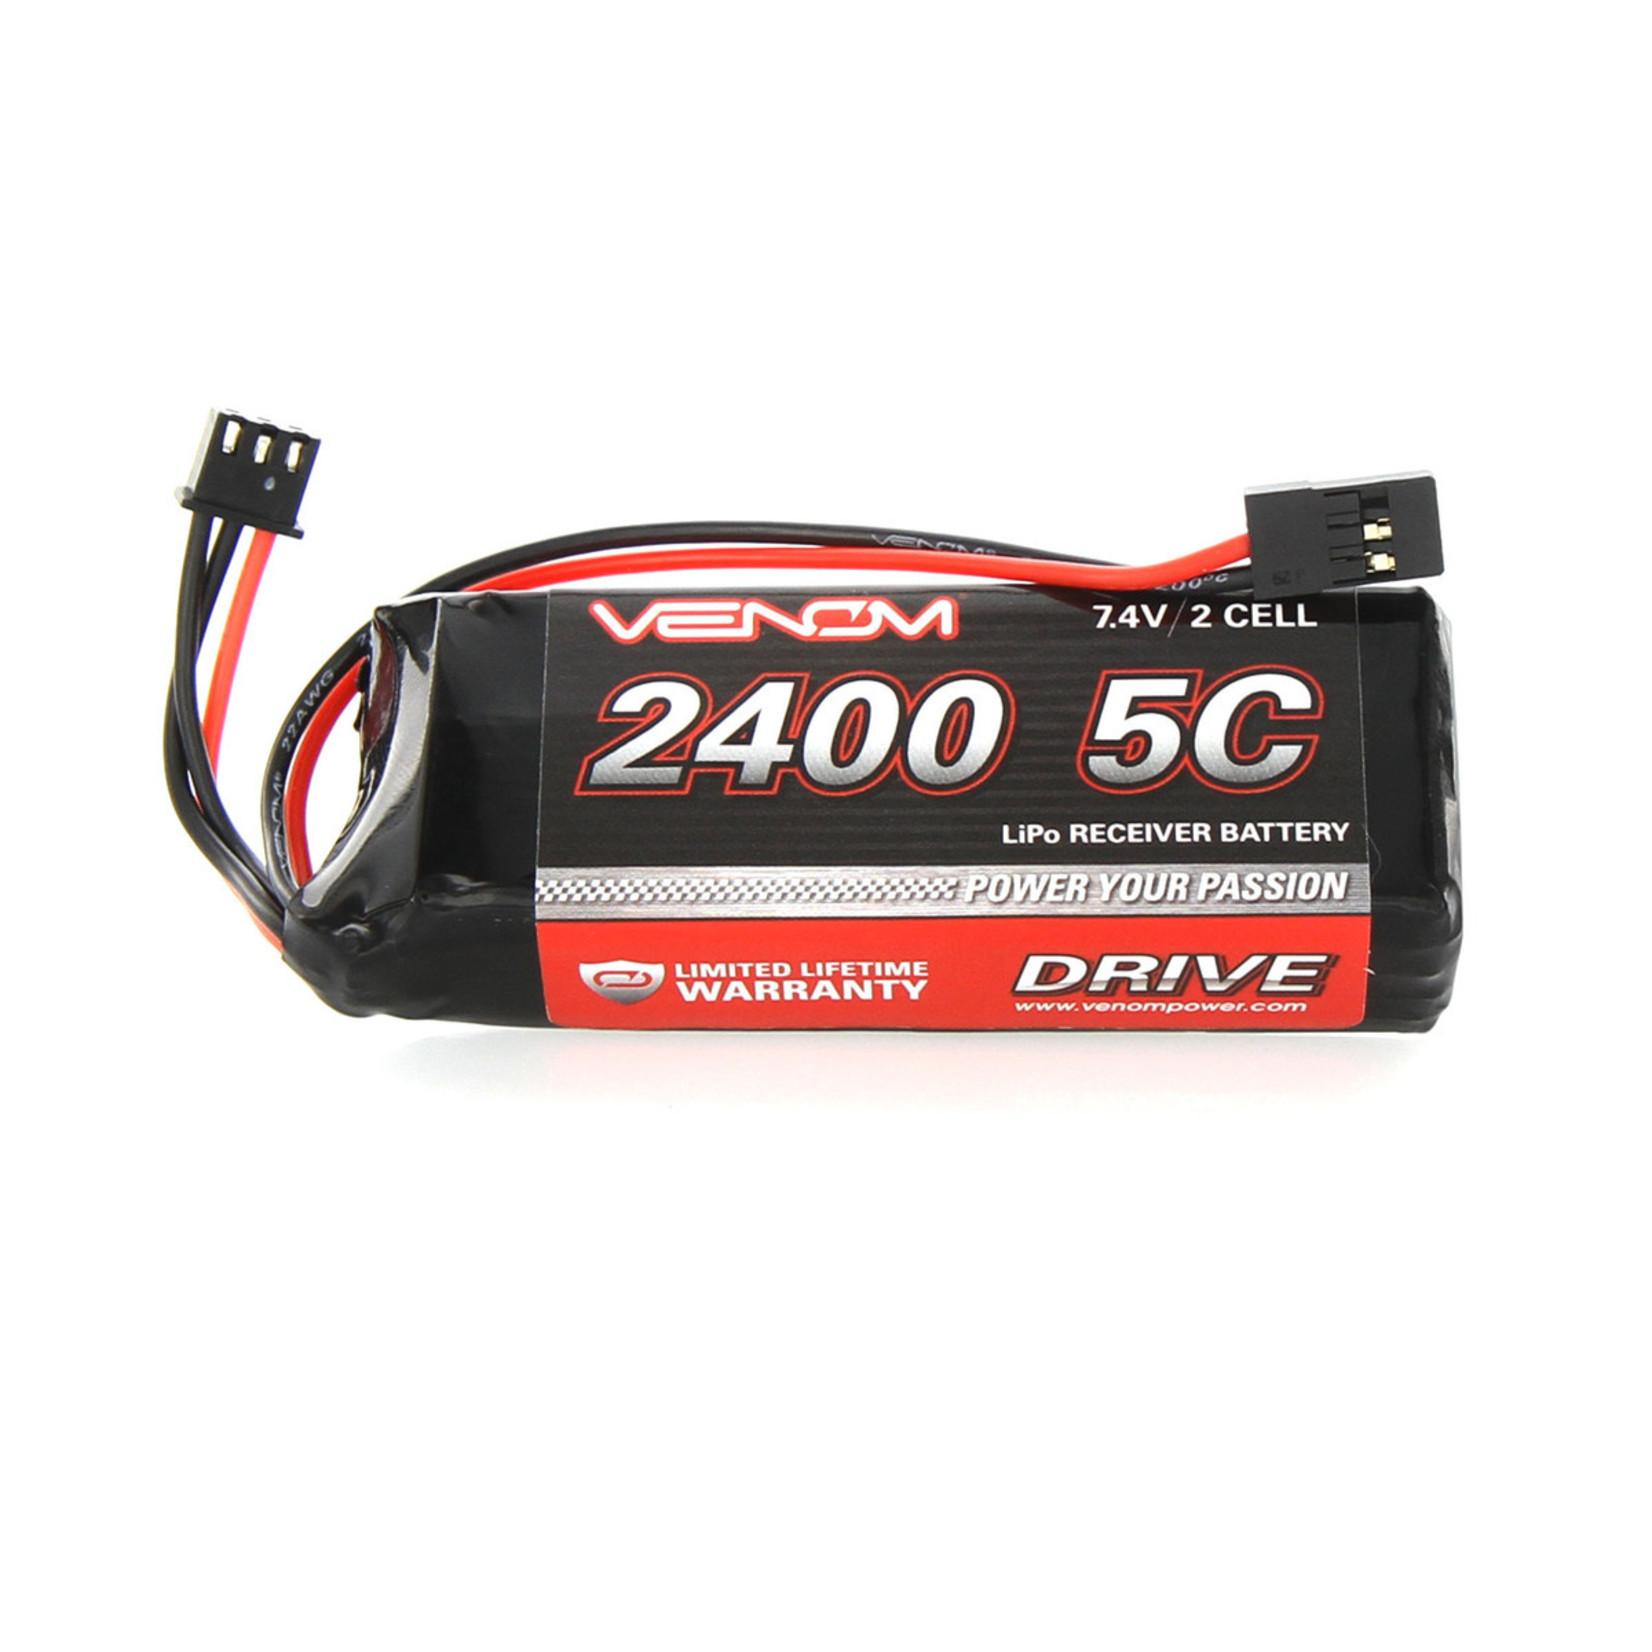 Venom VNR15000 Venom DRIVE 5C 2S 2400mAh 7.4V LiPo RX/TX Flat Pack